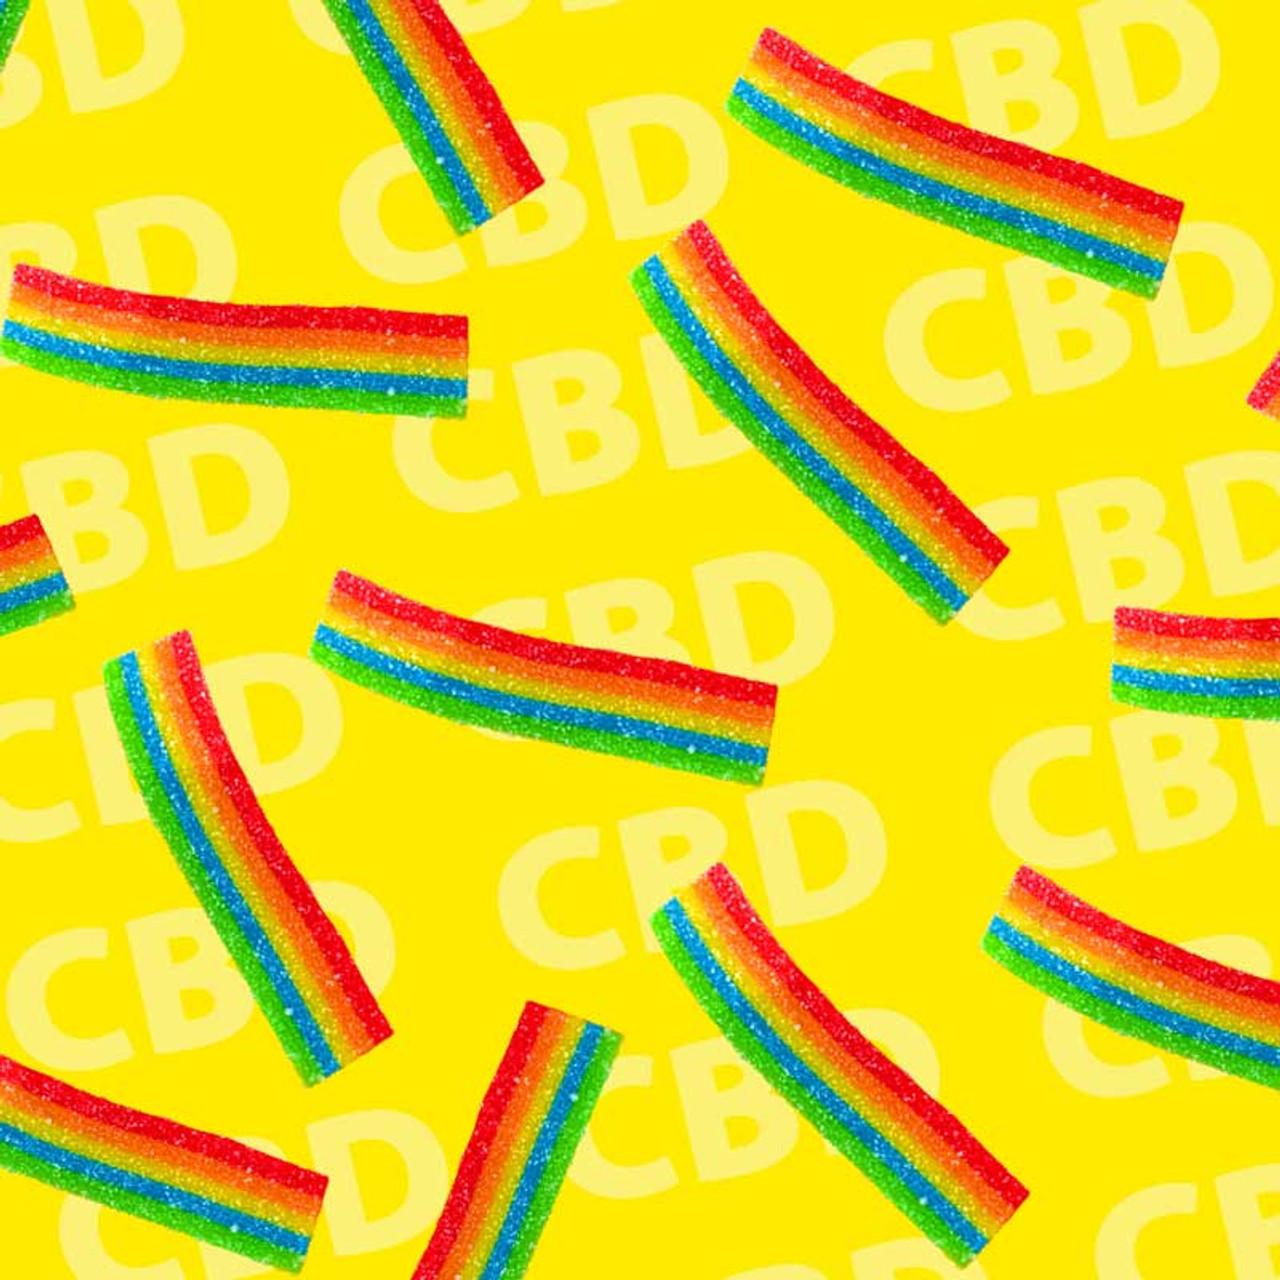 CBD Gummi Candy Ribbons Purchase